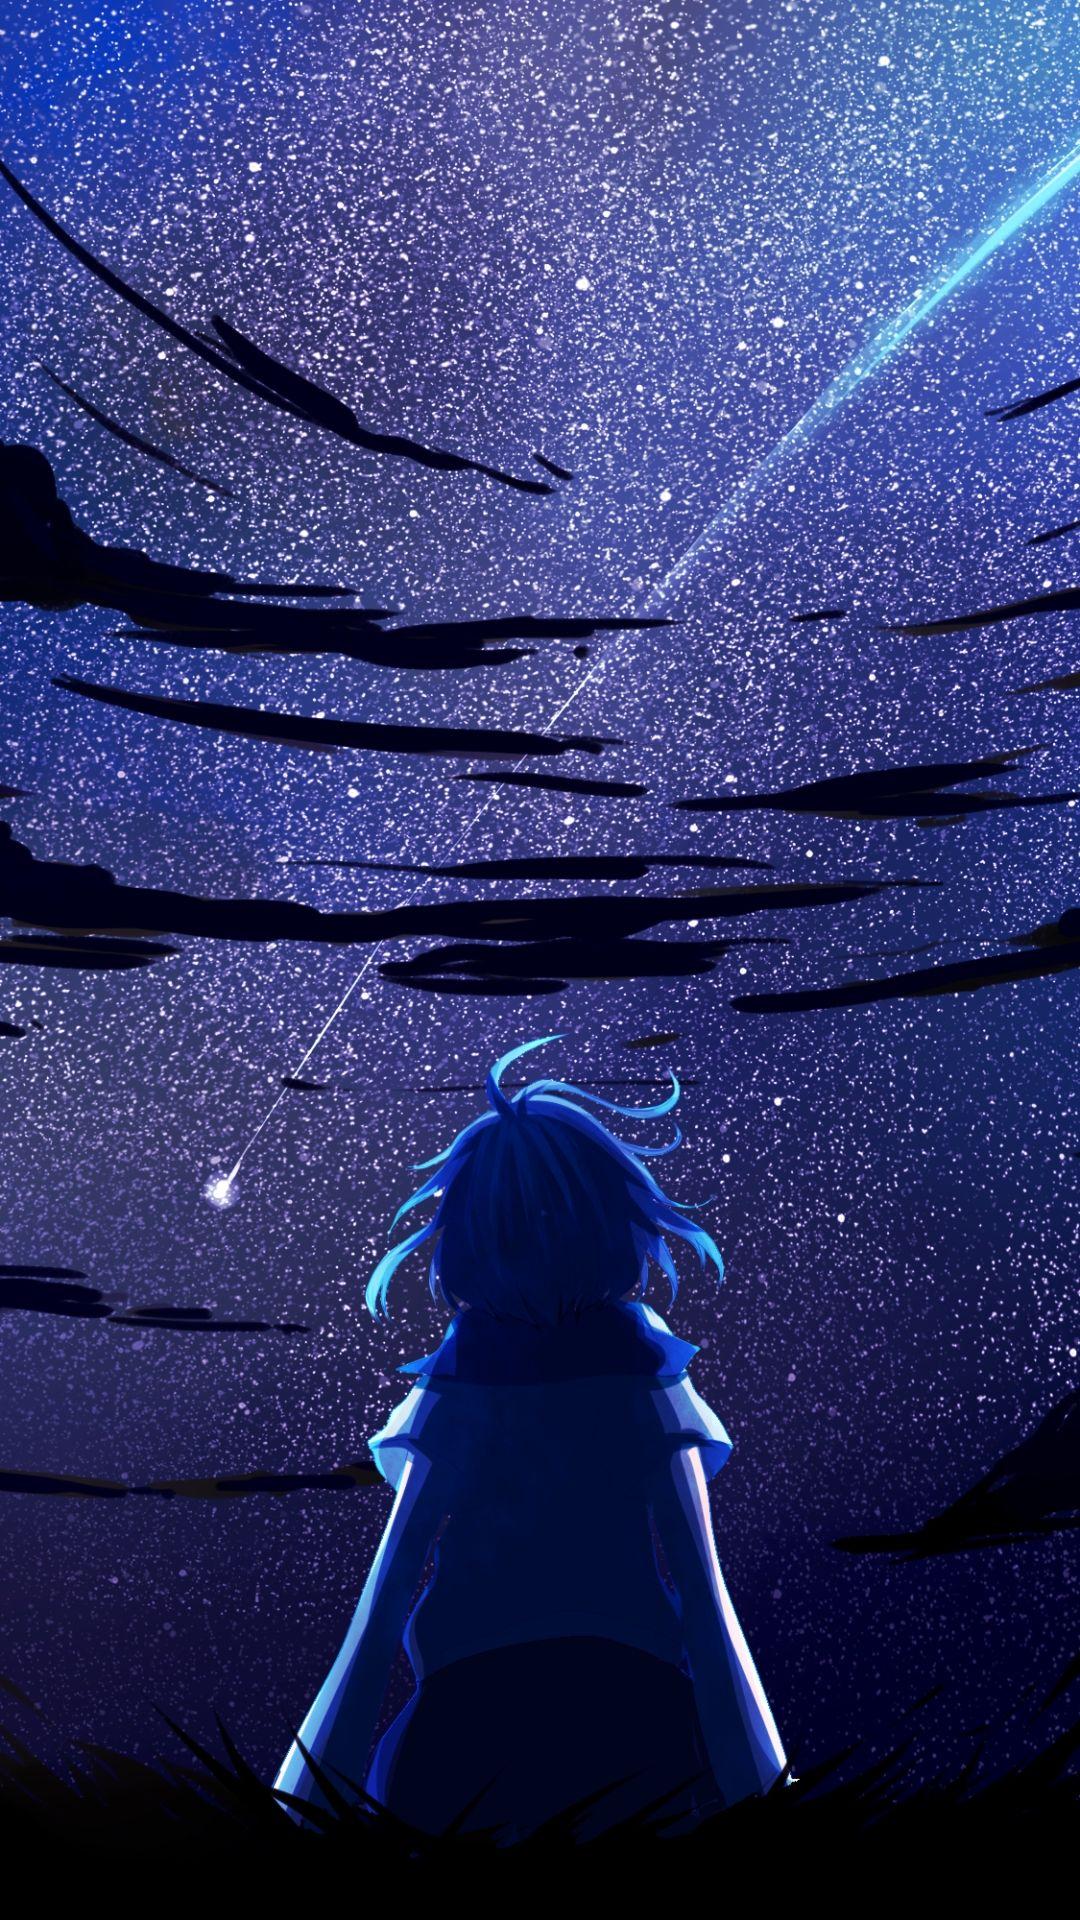 Sad Anime iOS 10 wallpaper